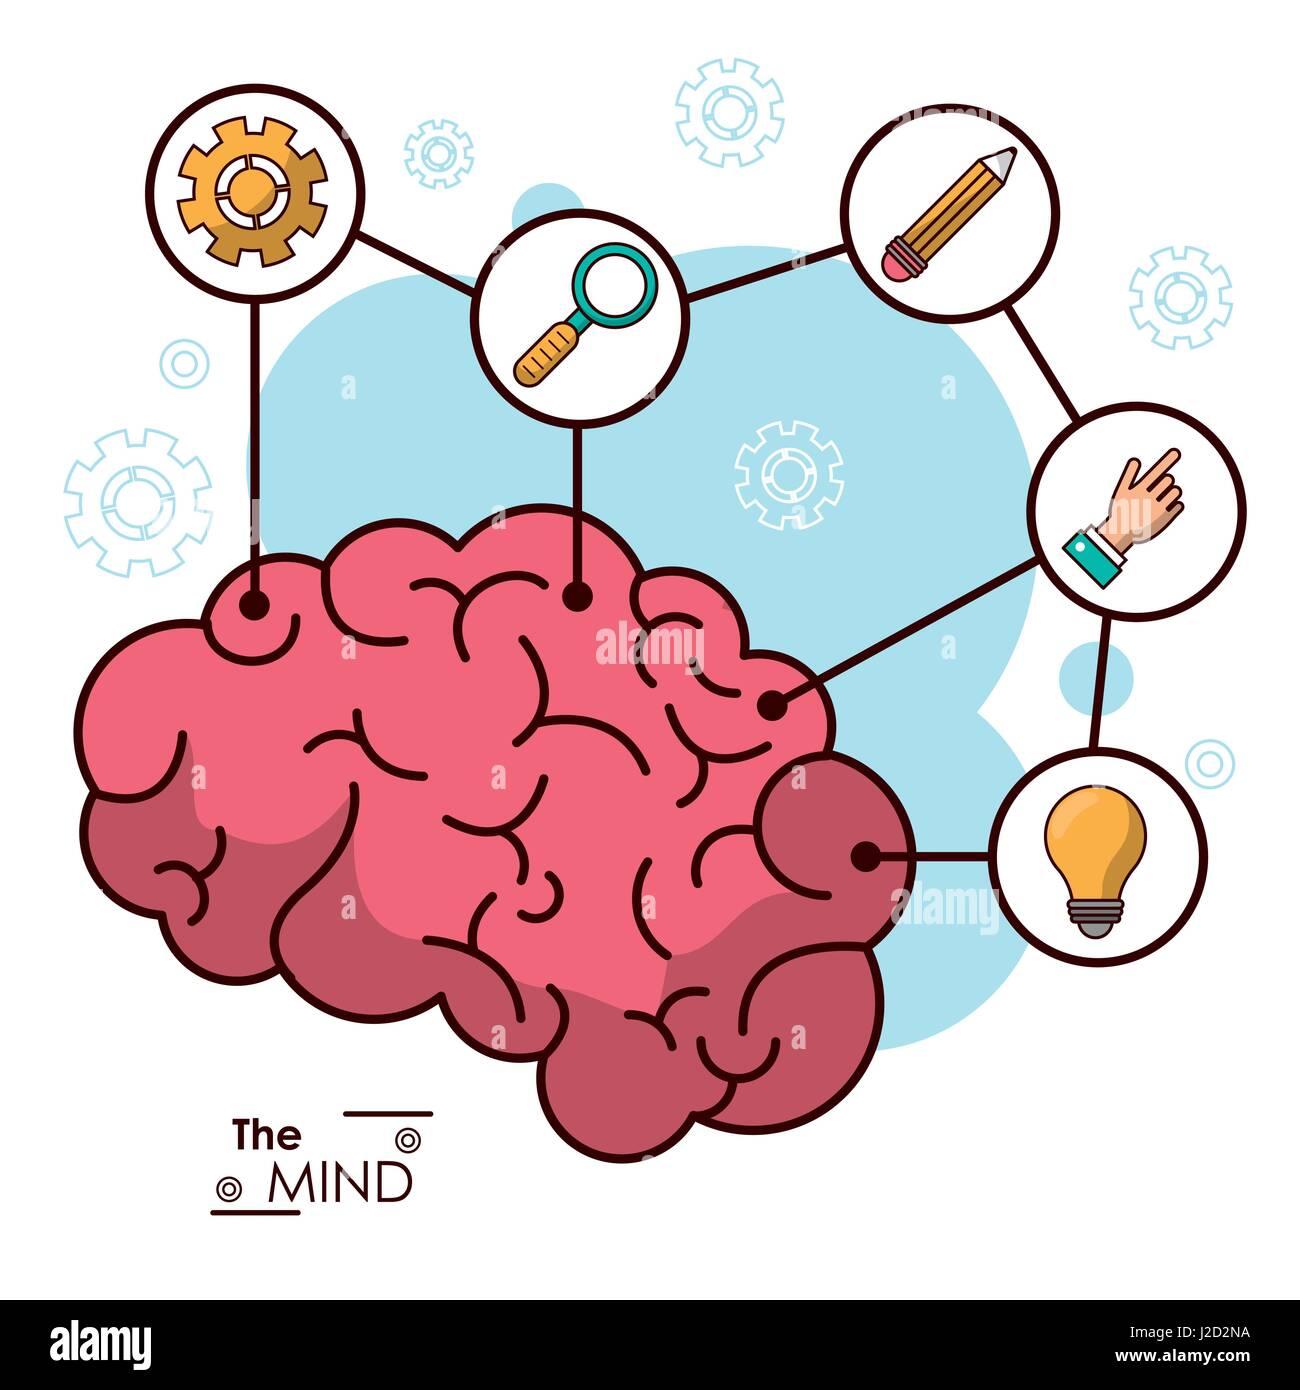 the mind human brain creative innovation idea - Stock Vector